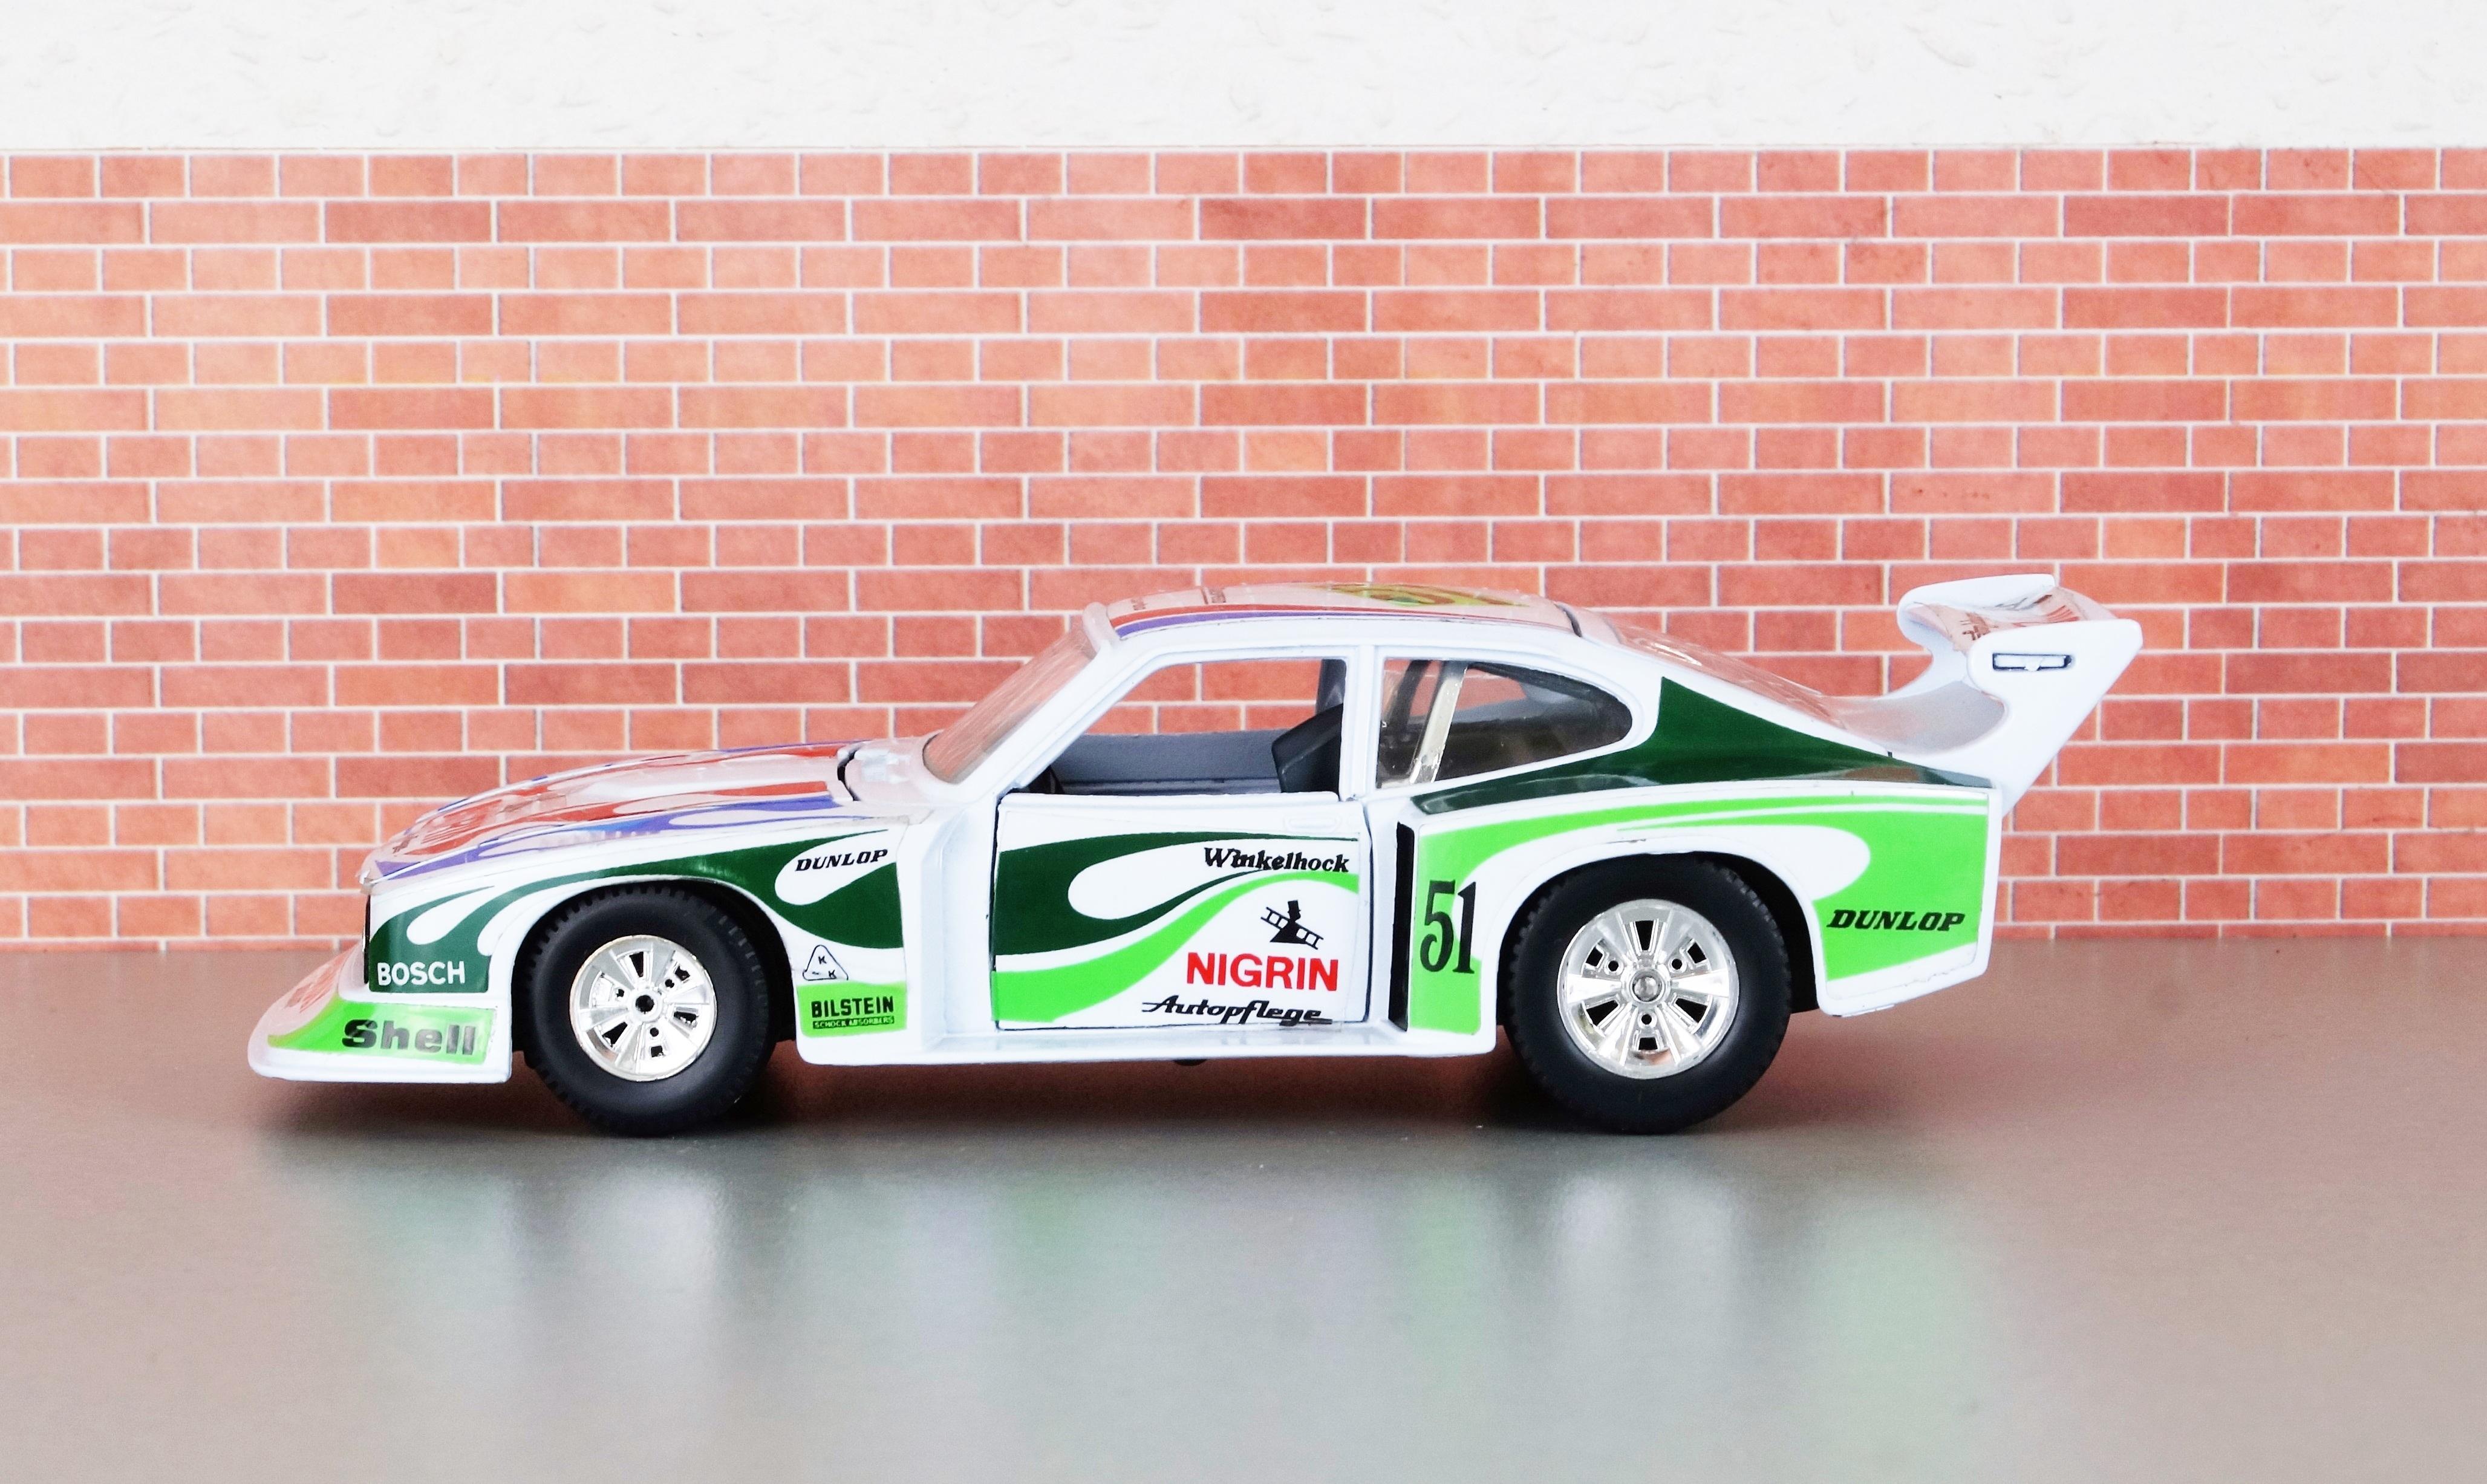 Free Images : red, auto, automotive, sports car, race car, supercar ...